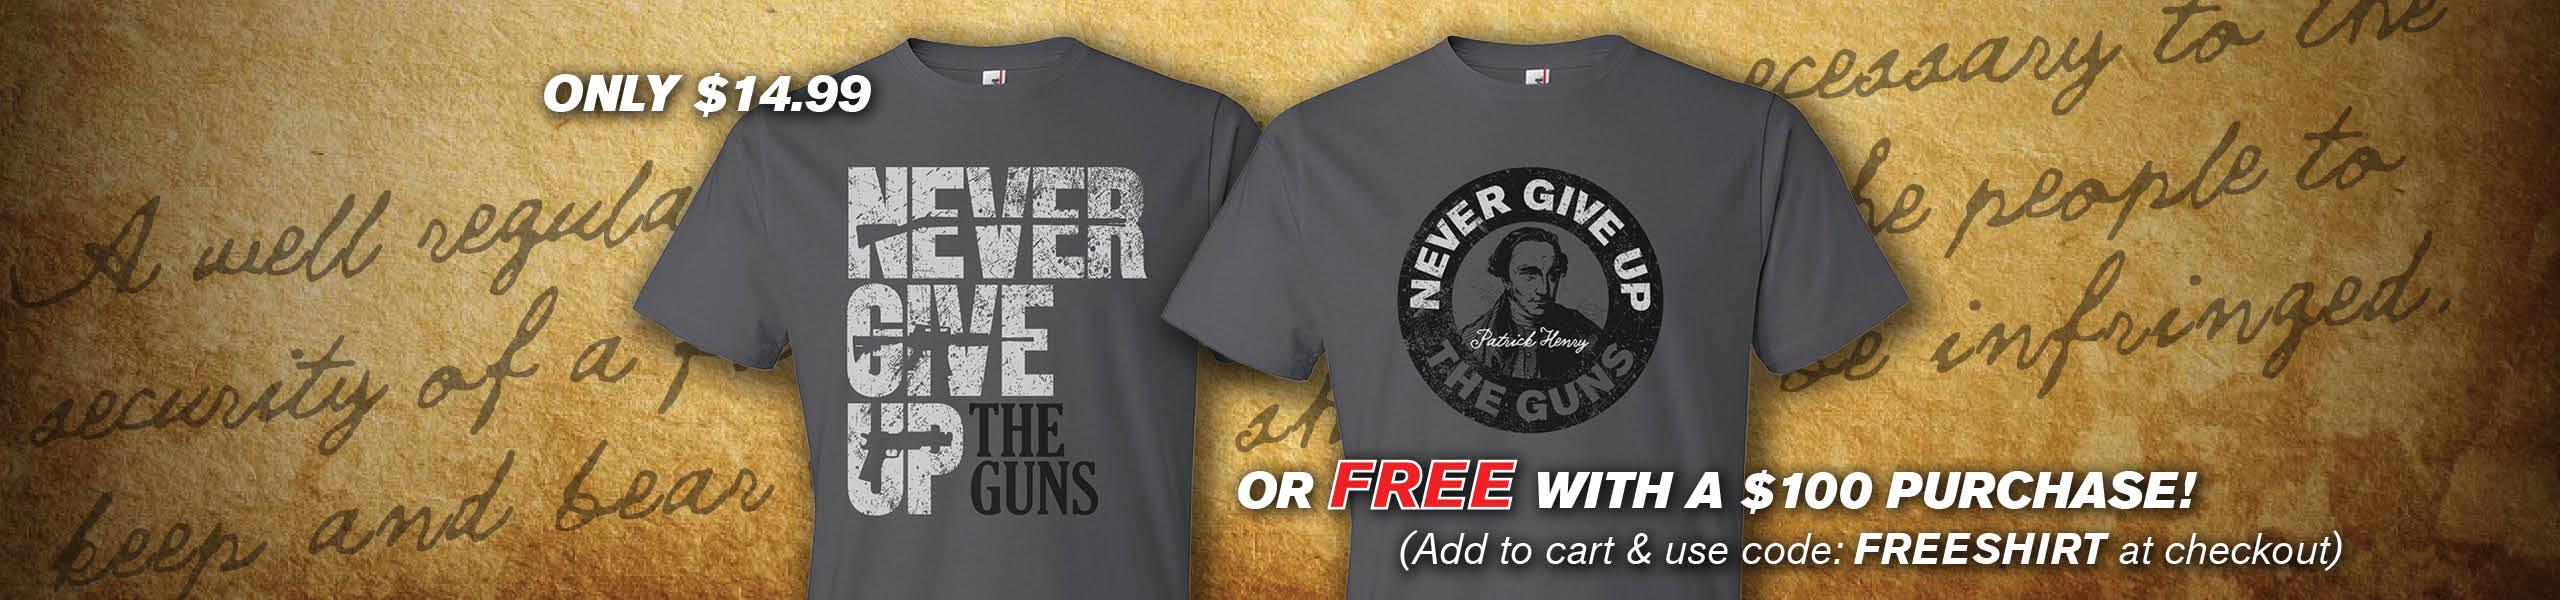 Never Give Up The Guns Tee - Second Amendment Gun Rights T-Shirts